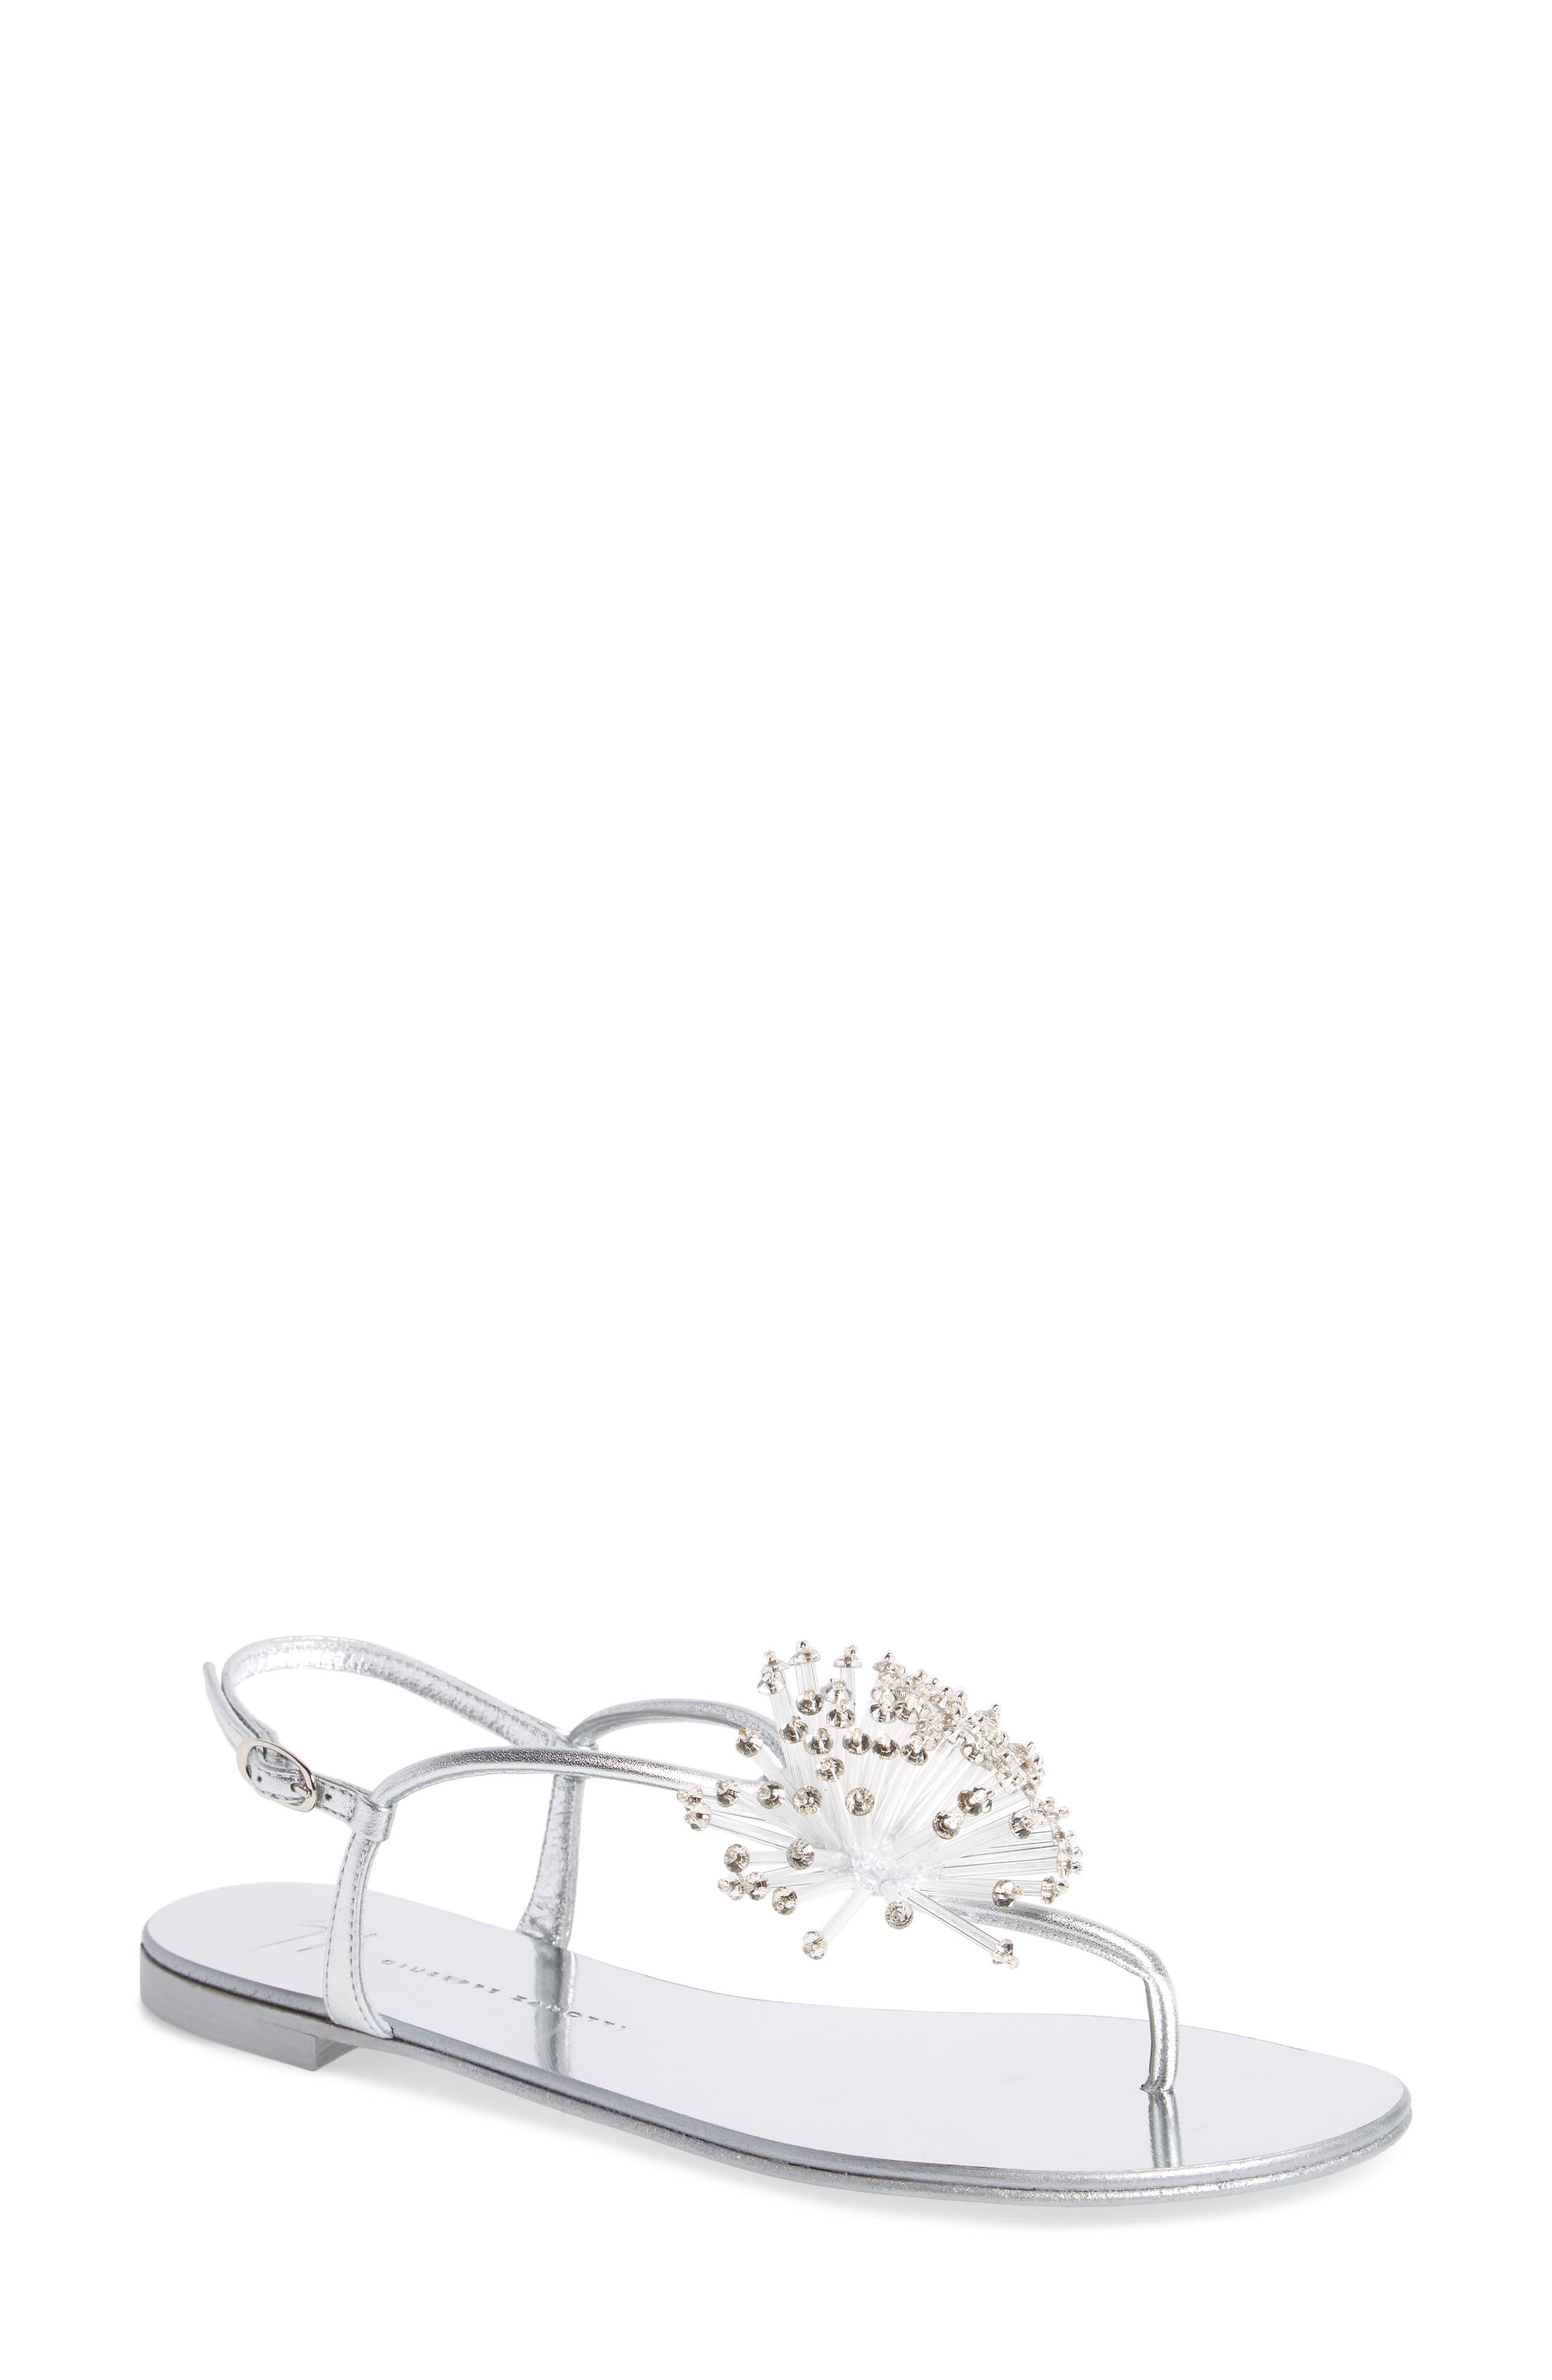 Guiseppe Zanotti Flower Burst Sandal,                         Main,                         color, Silver